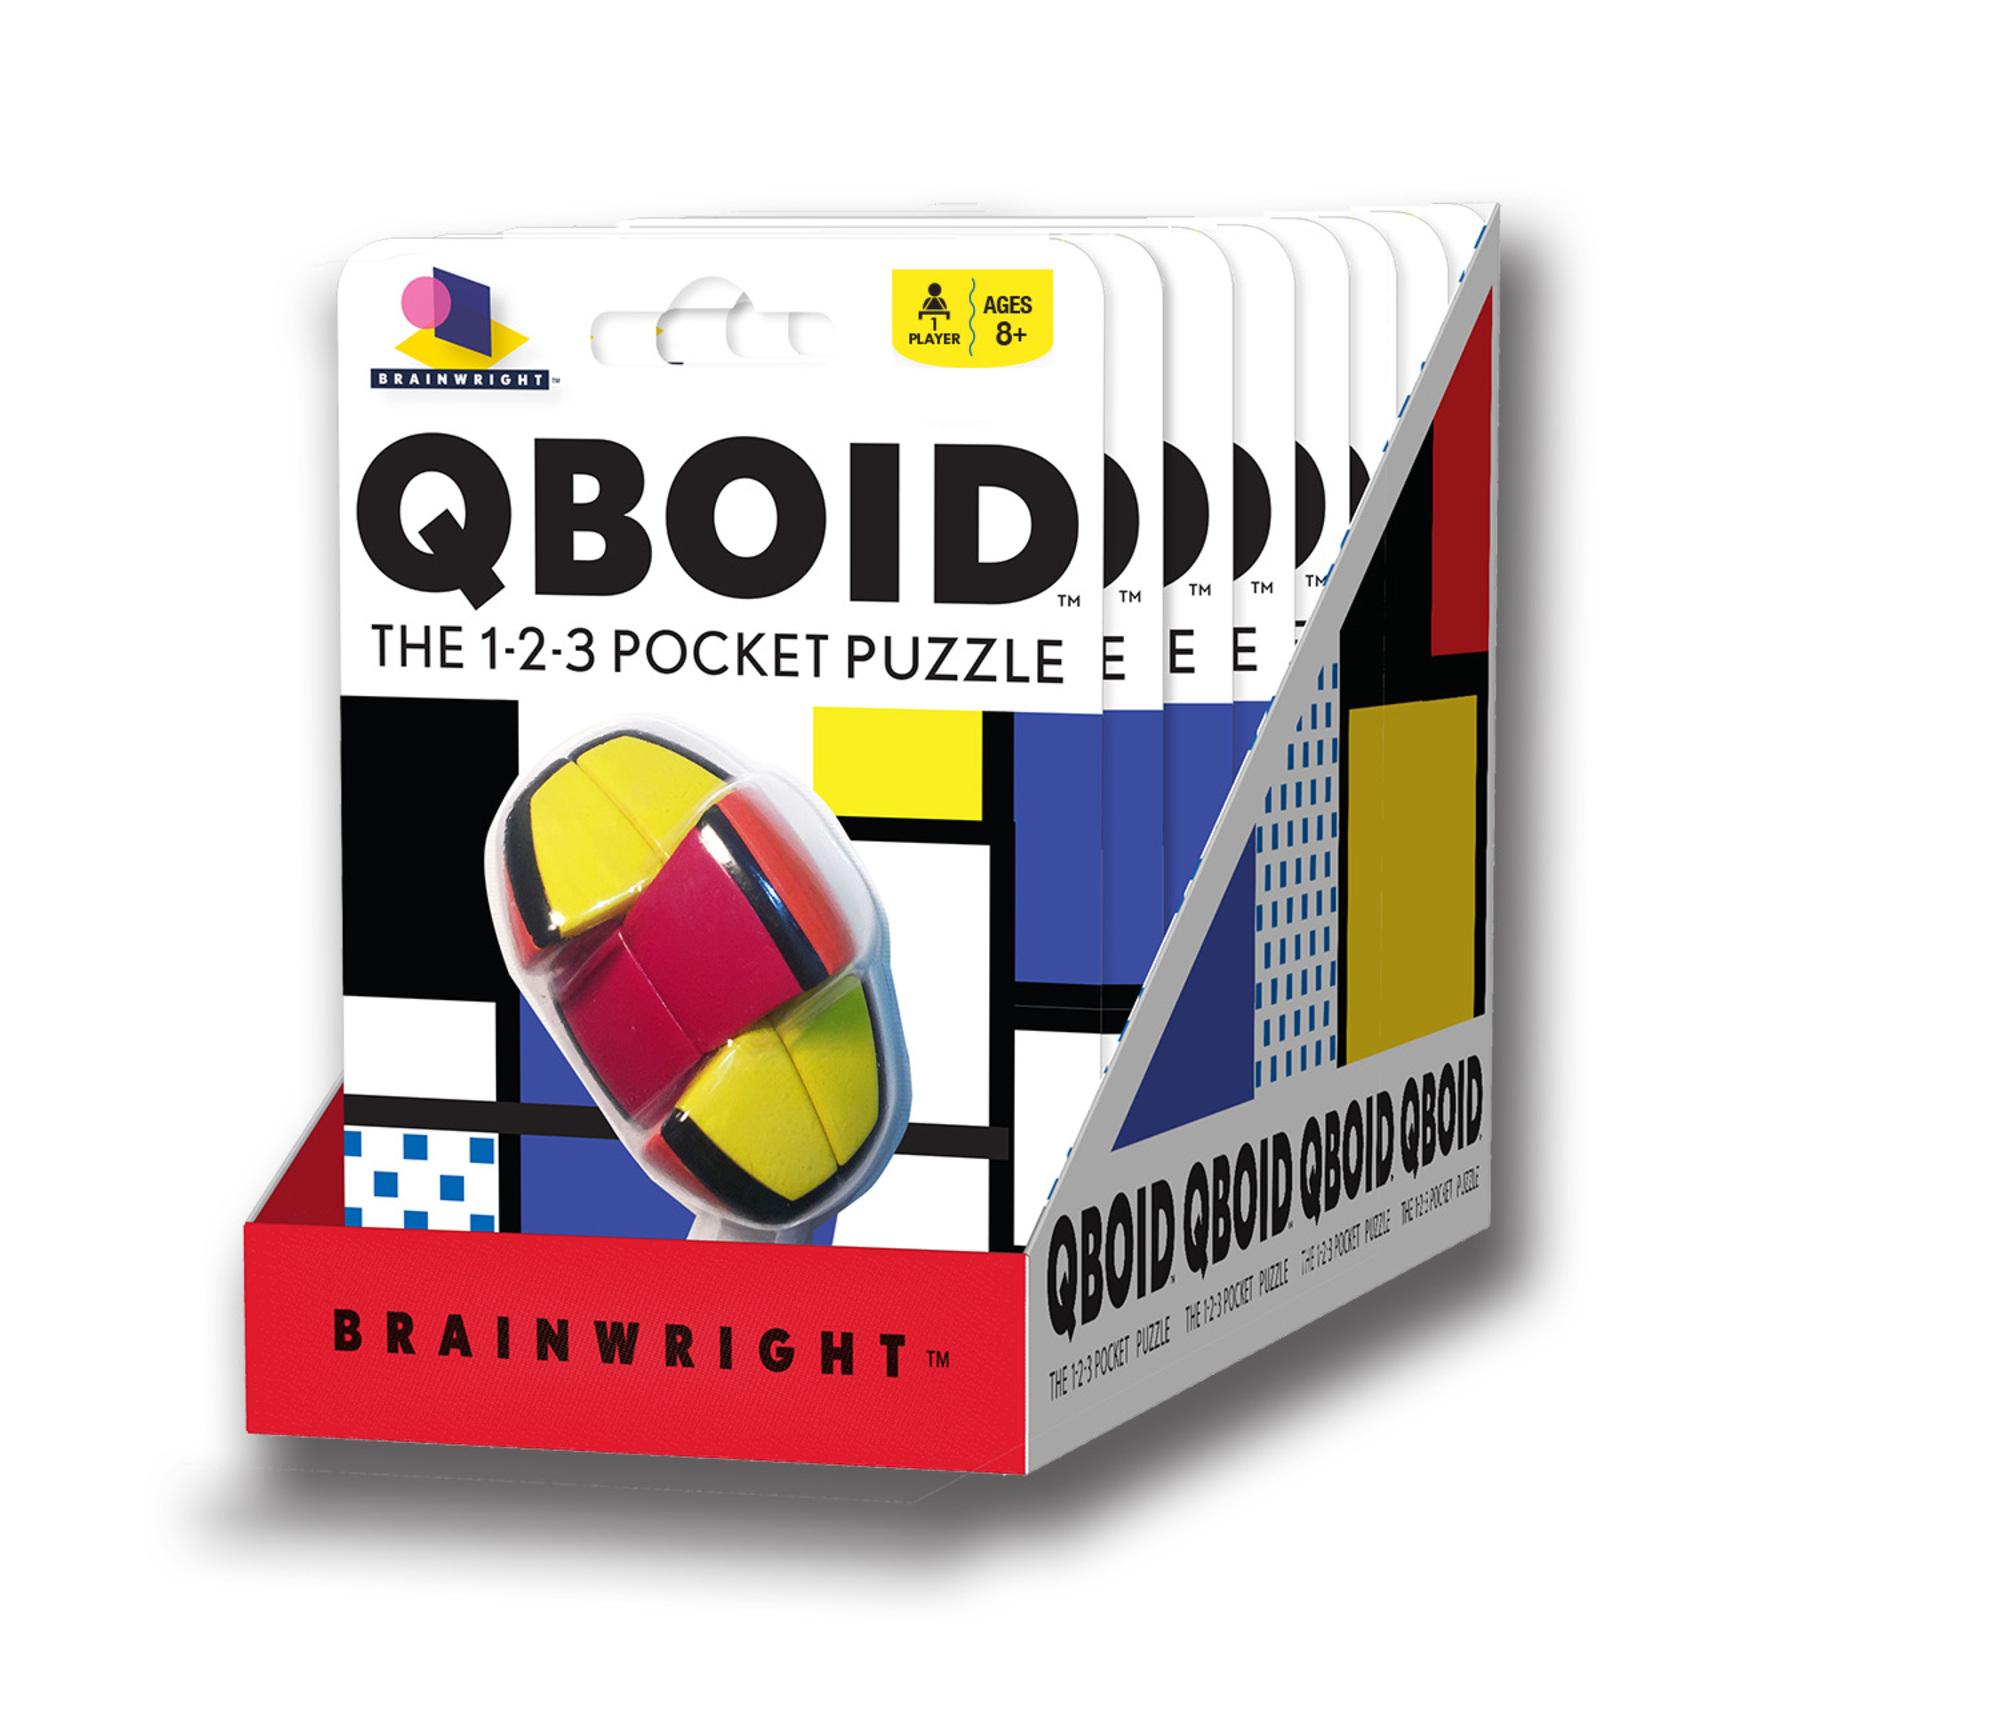 Qboid